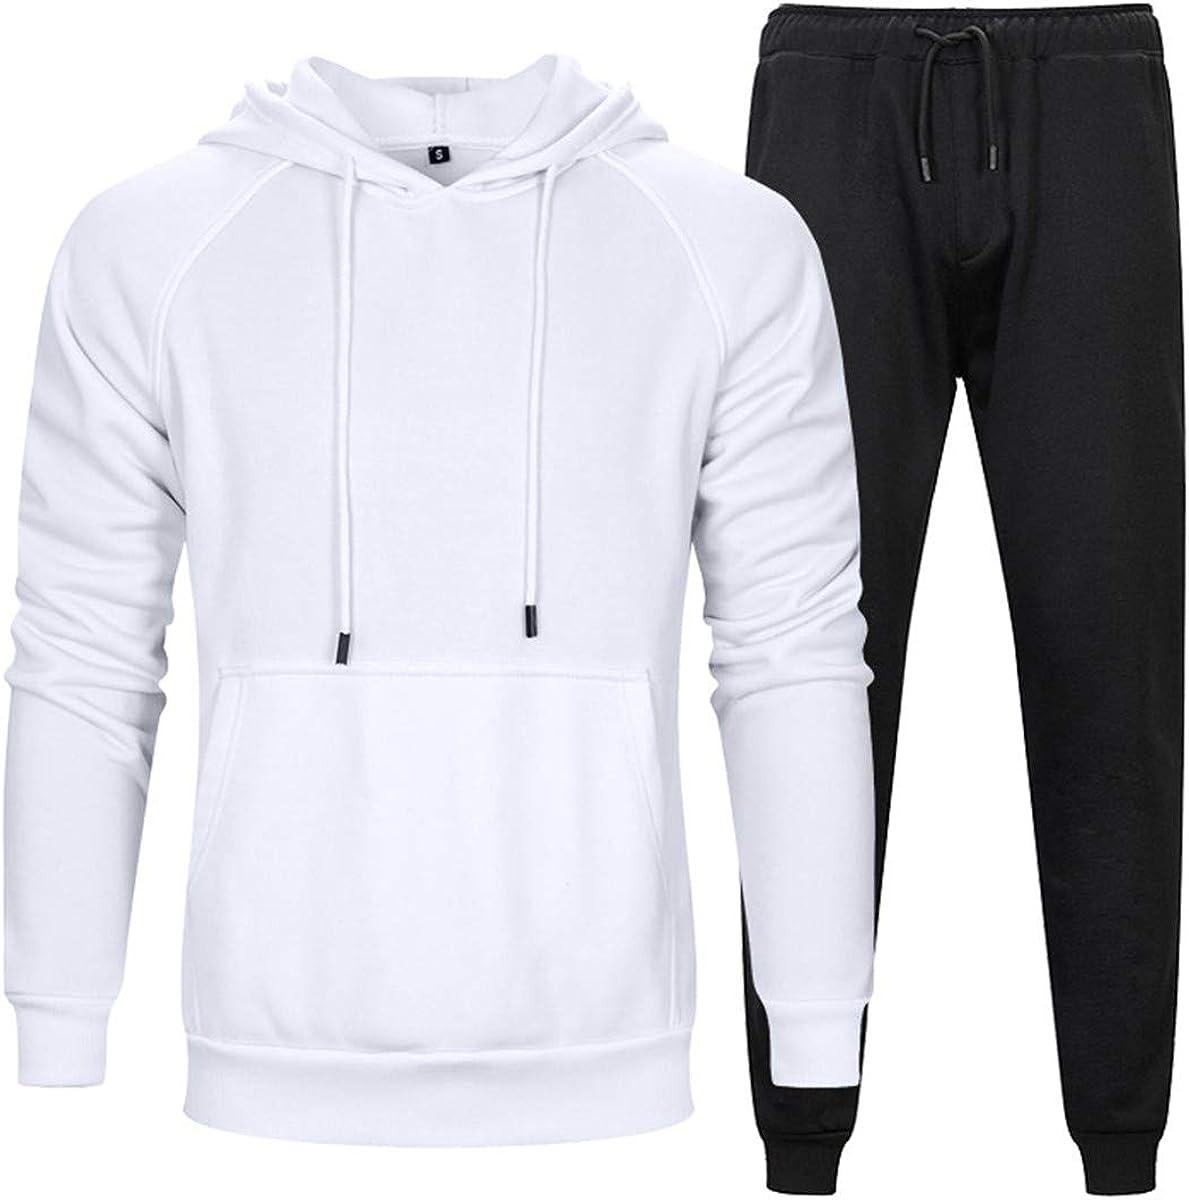 Aeneontrue Men's Tracksuit Pullover Sweat Shirts & Pants Gym Sports Suit Set Casual Sweatsuits